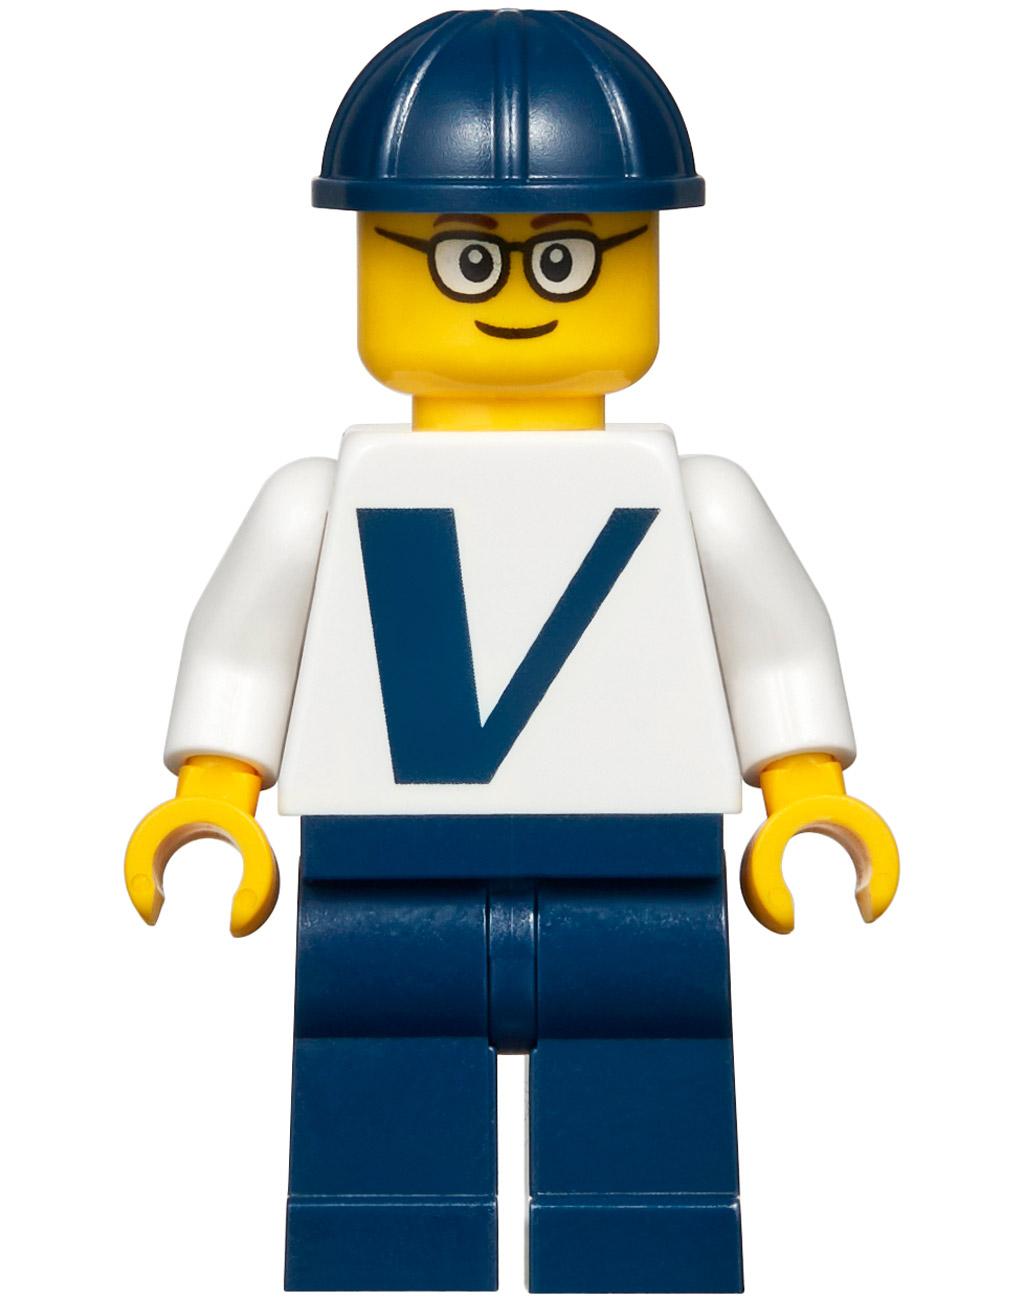 lego-creator-expert-vestas-windkraftanlage-10268-minifigur-logo-front-3-2018 zusammengebaut.com